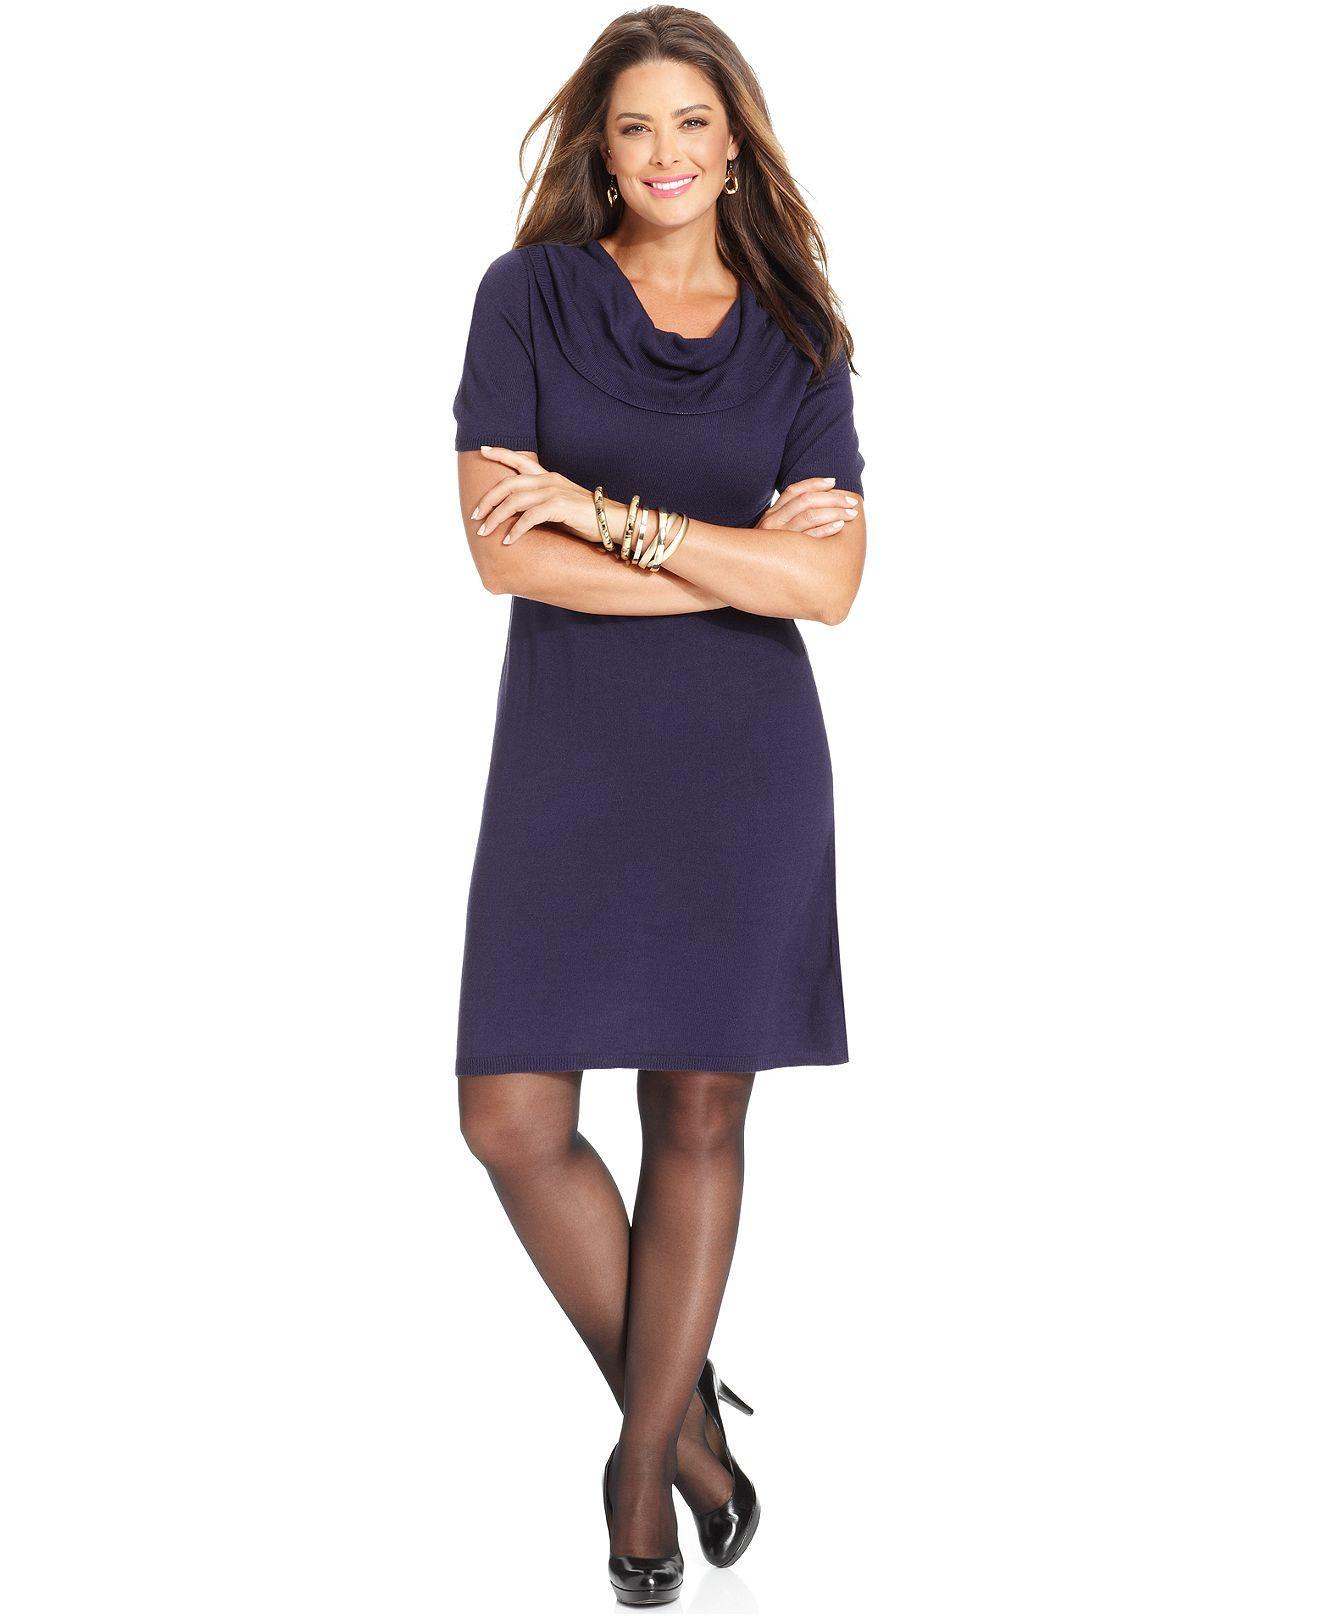 16ac3857cb1 Love Squared Plus Size Short-Sleeve Sweater Dress - Plus Size Dresses - Plus  Sizes - Macy s